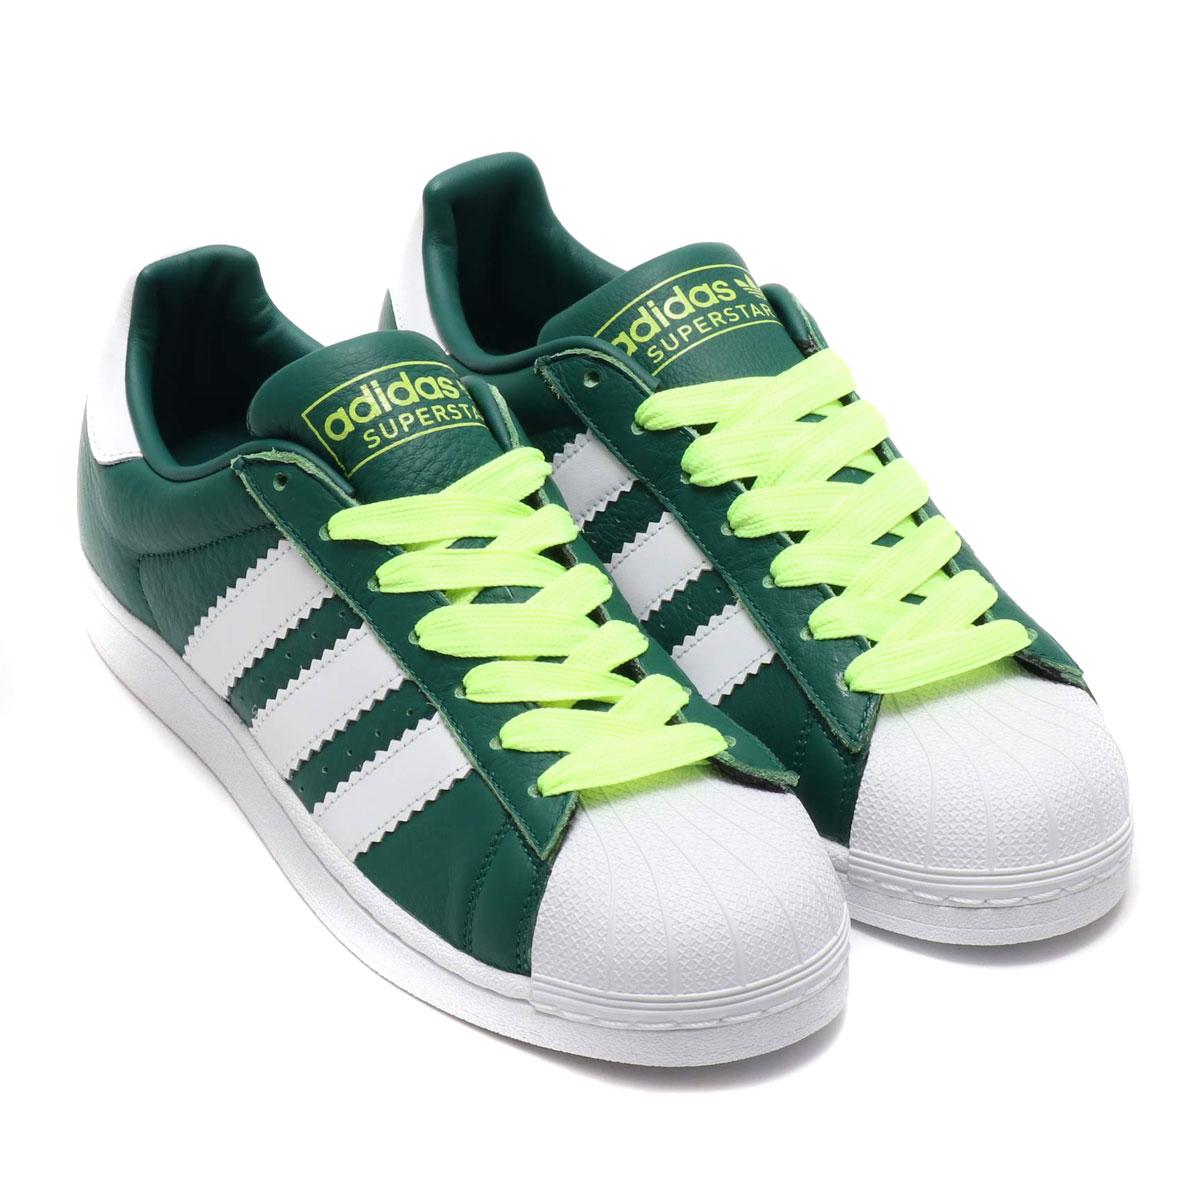 adidas Originals SUPERSTAR(アディダスオリジナルス スパースター) COLLEGEATE GREEN/RUNNING WHITE/HI-RES YELLOW【メンズ レディース スニーカー】19SS-S